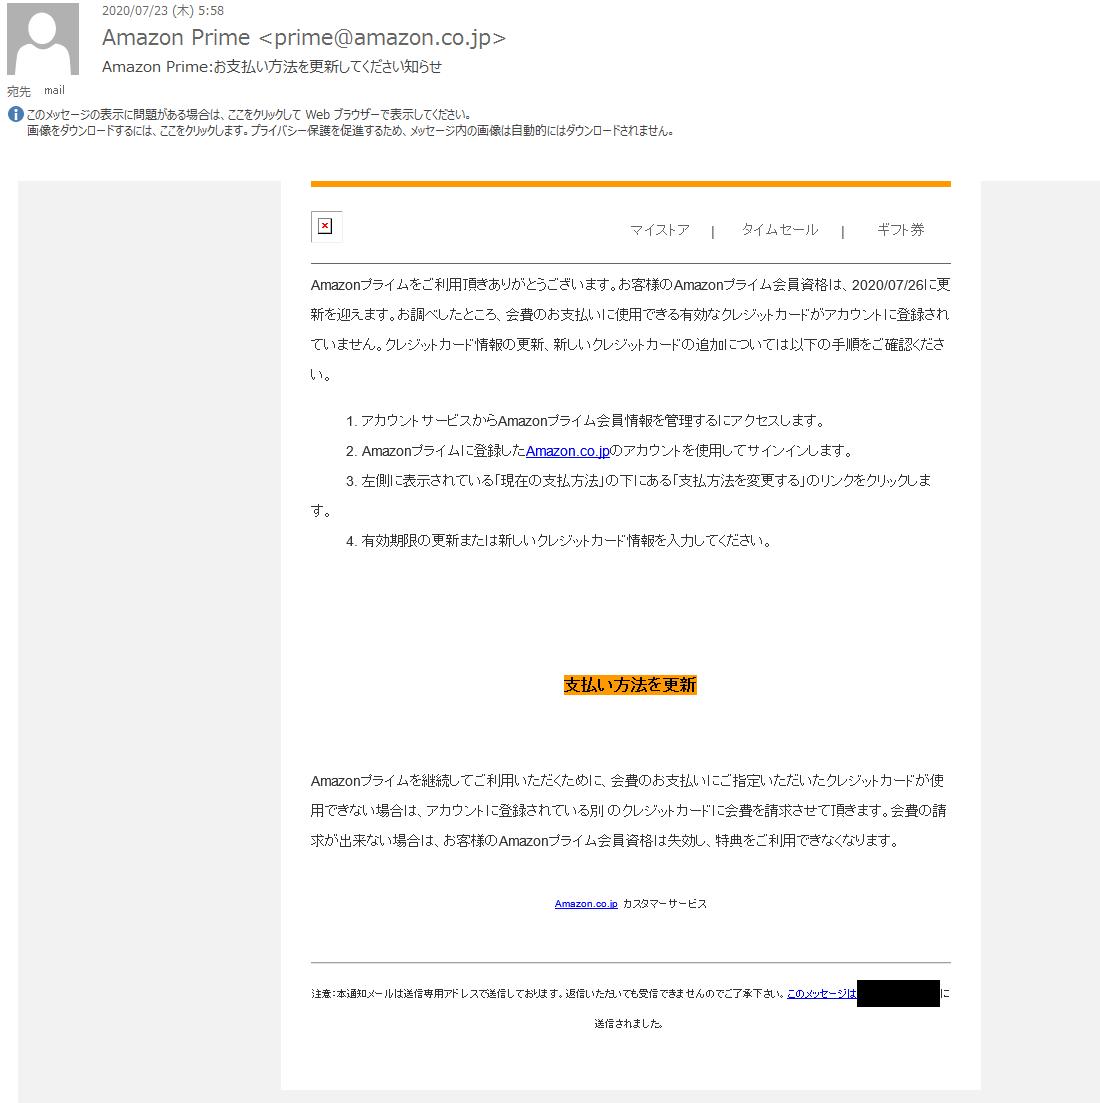 Amazon サイン イン が 検出 され まし た